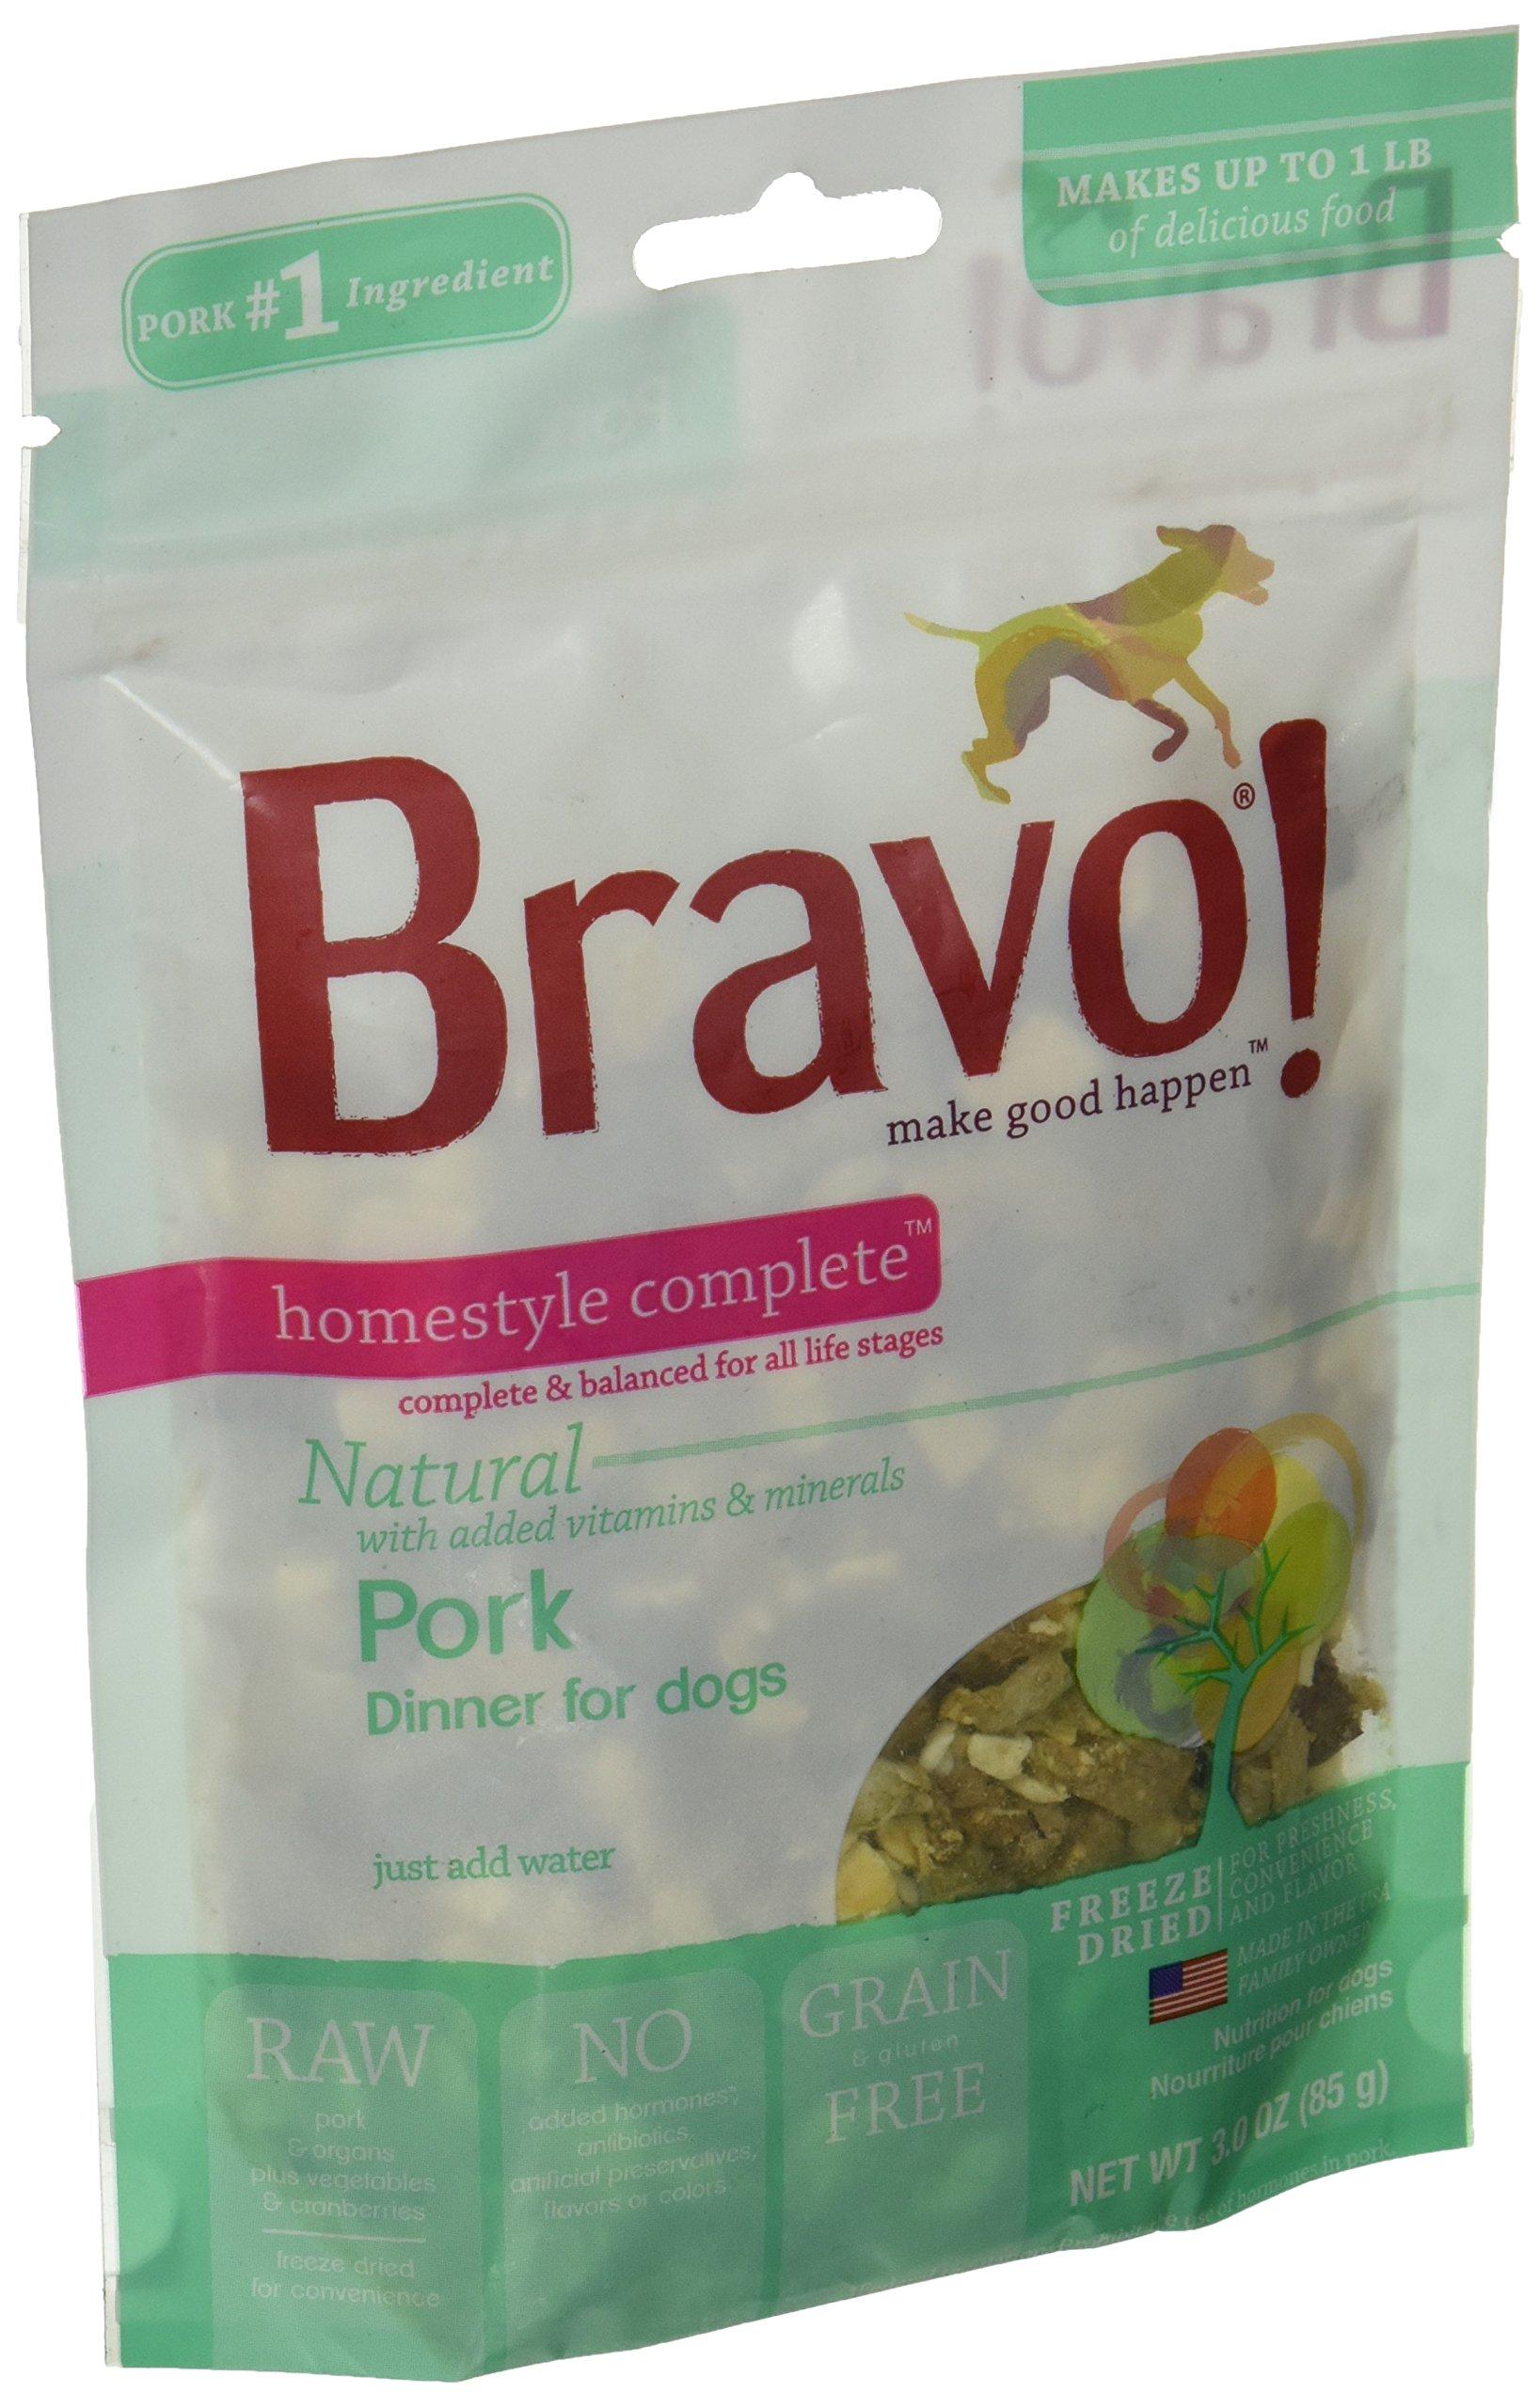 Bravo Homestyle Freeze Dried Dinner Pork Food, 3 oz.